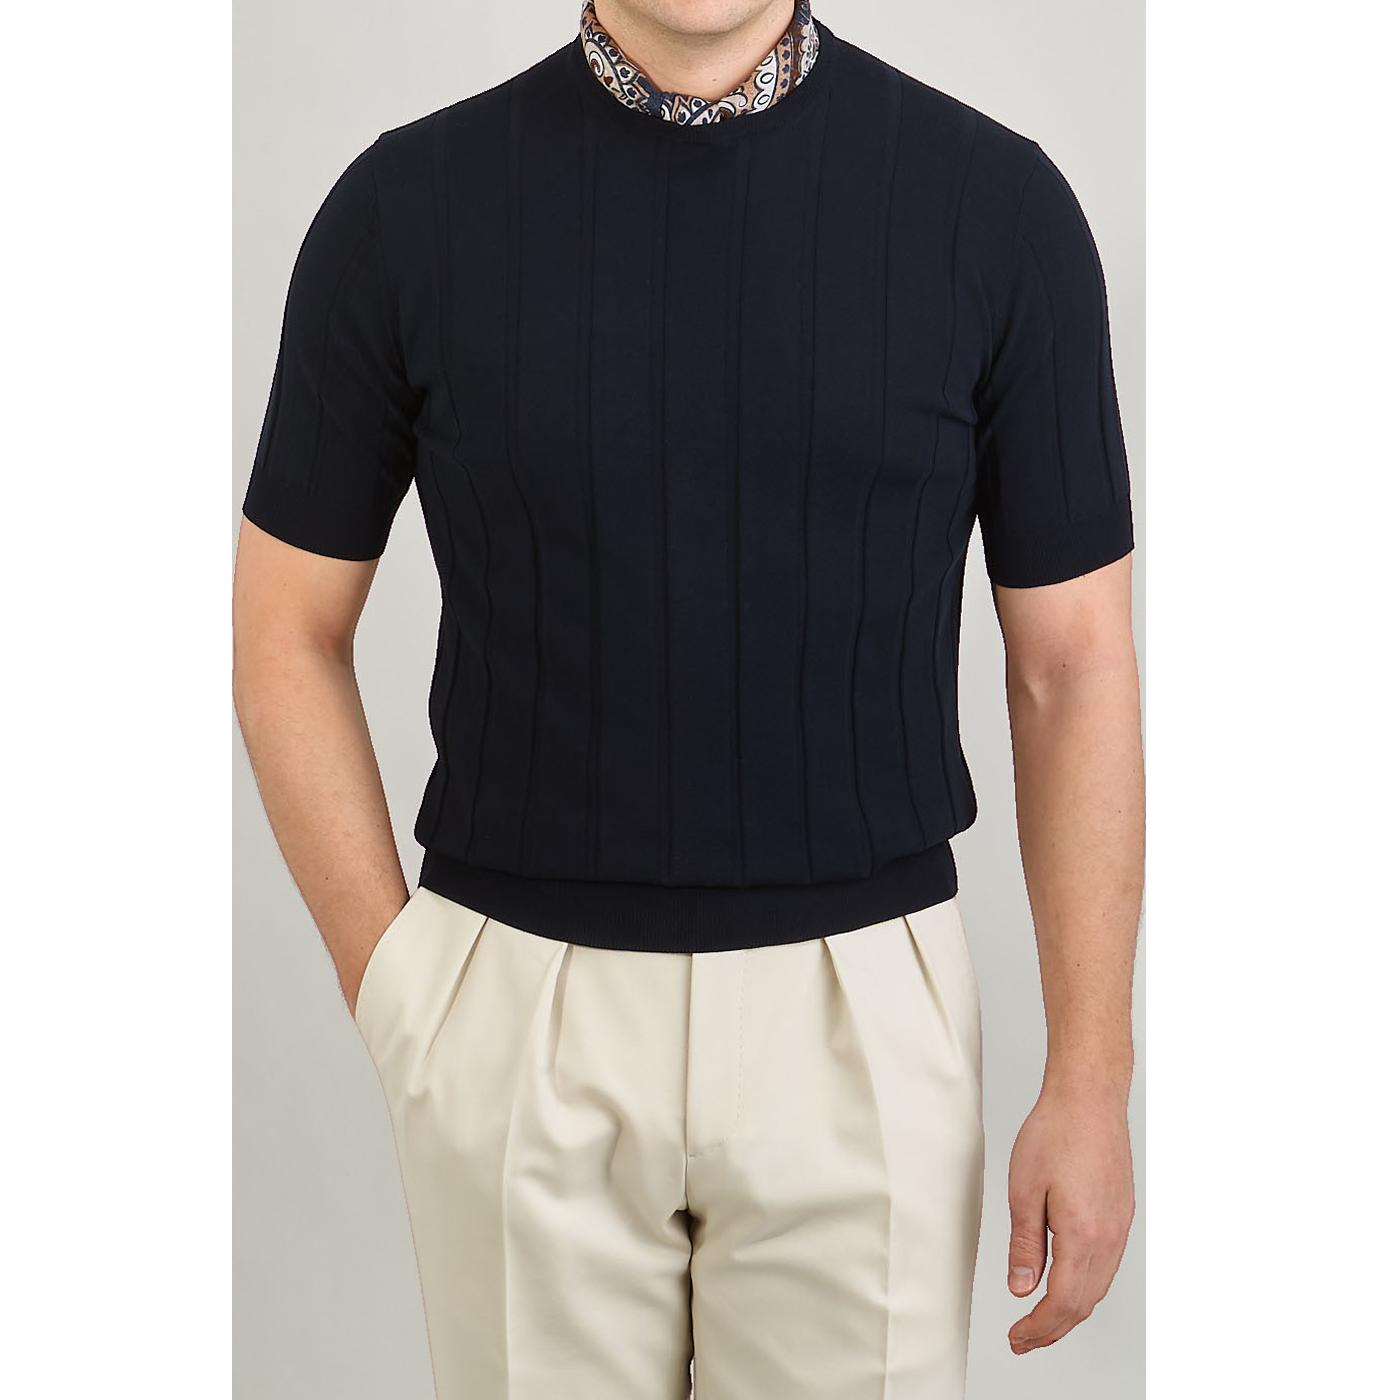 Lardini Navy Rib Knitted Cotton T-shirt Front